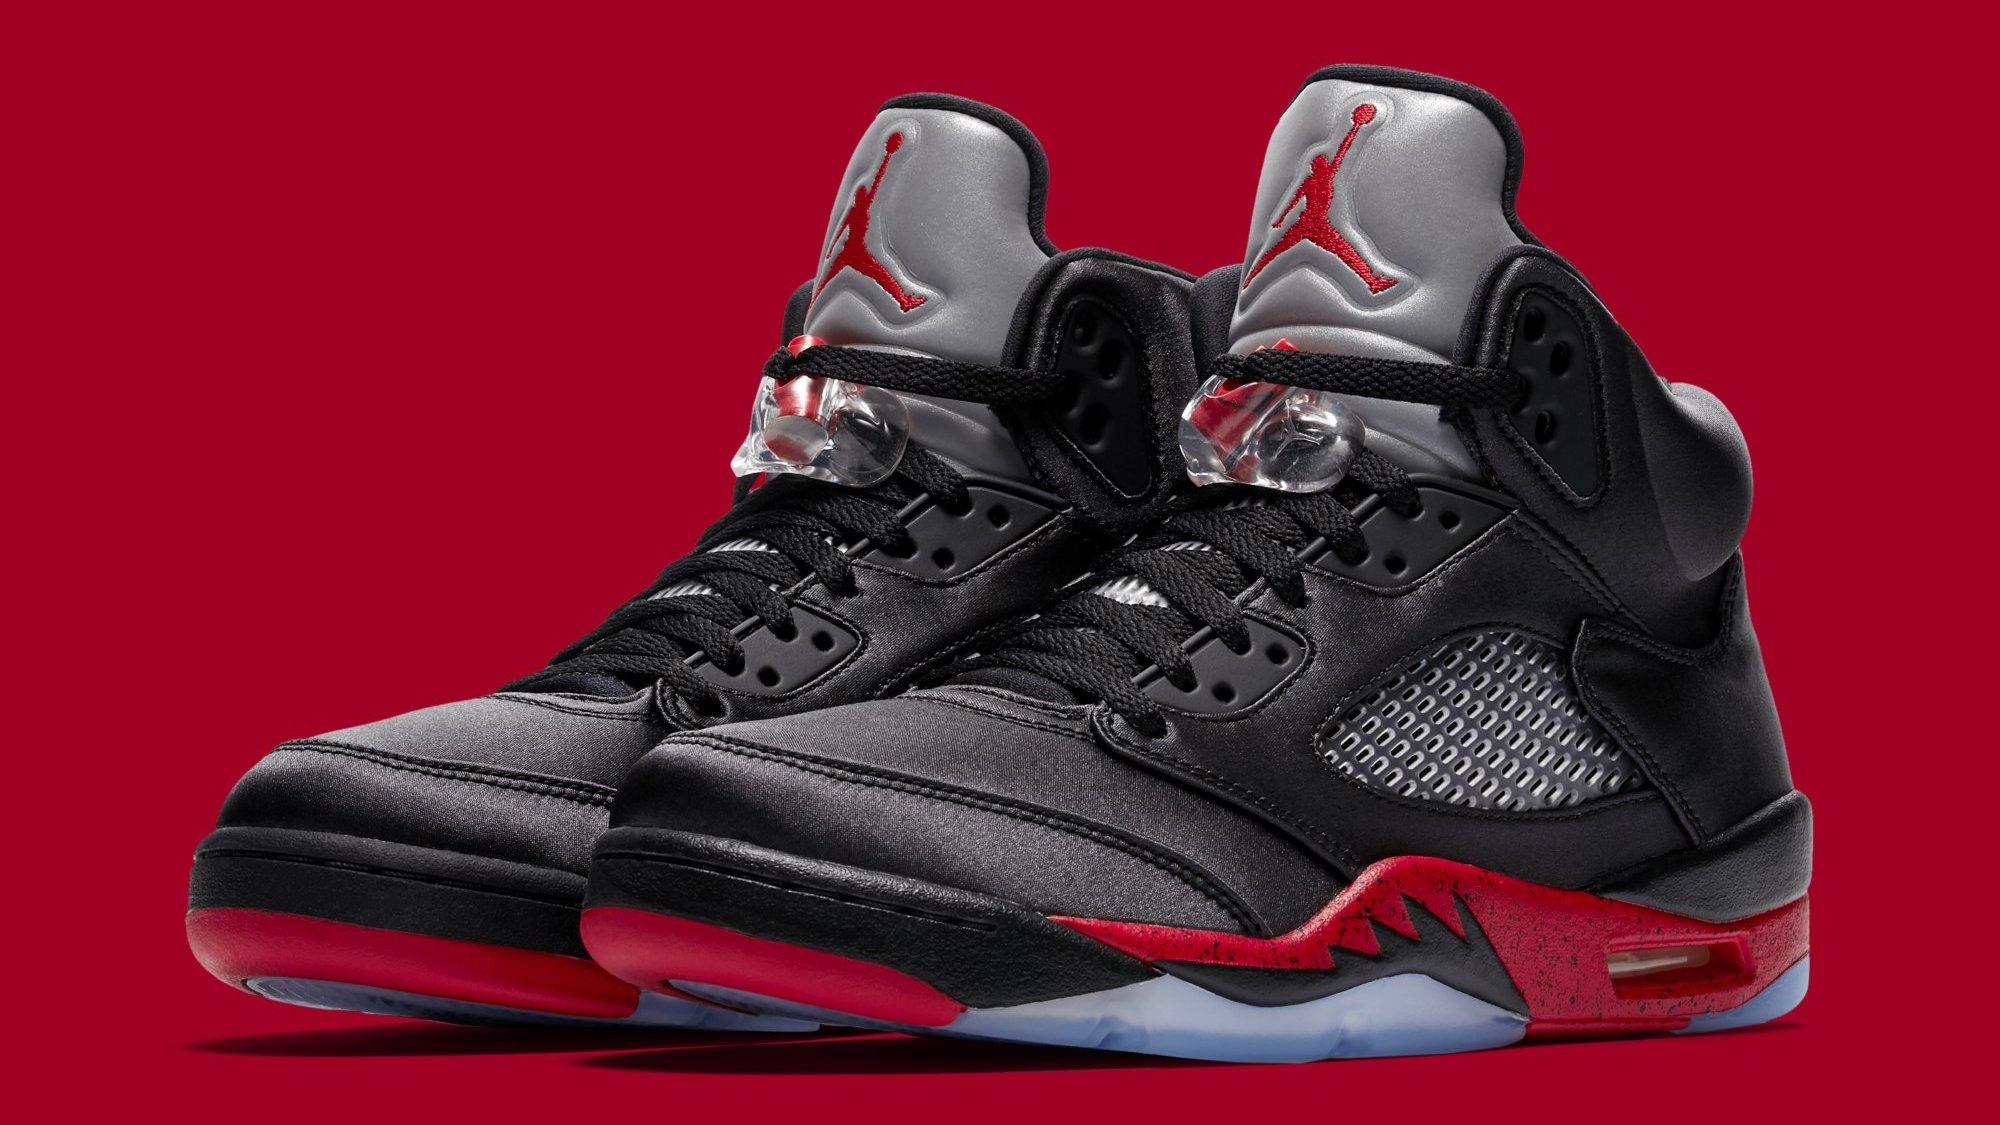 82eeb3753bb6e Air Jordan 5  Black University Red  Release Date